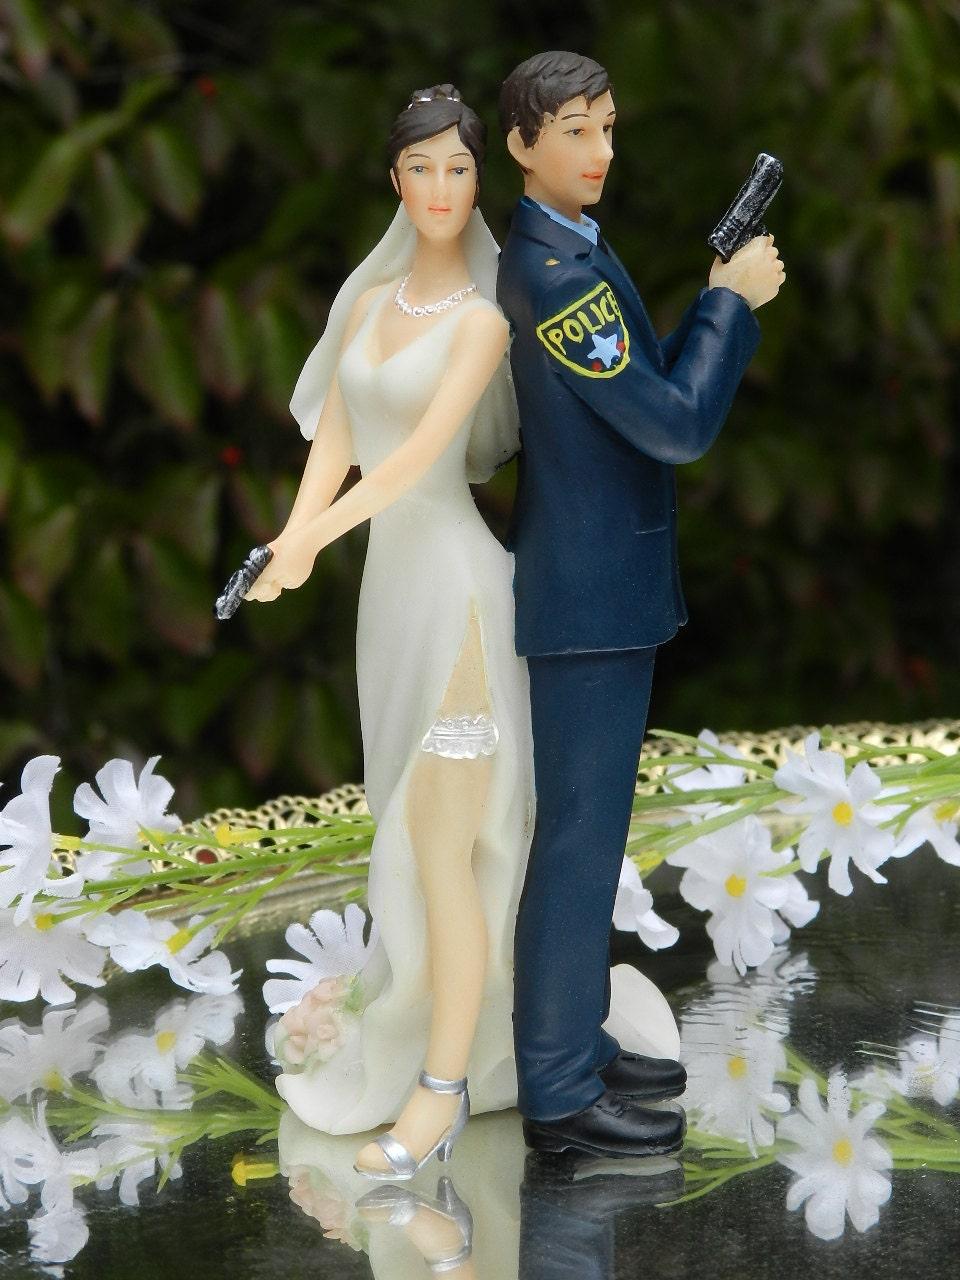 Police Officer Bride Groom Guns Wedding Cake By Carolinacarla